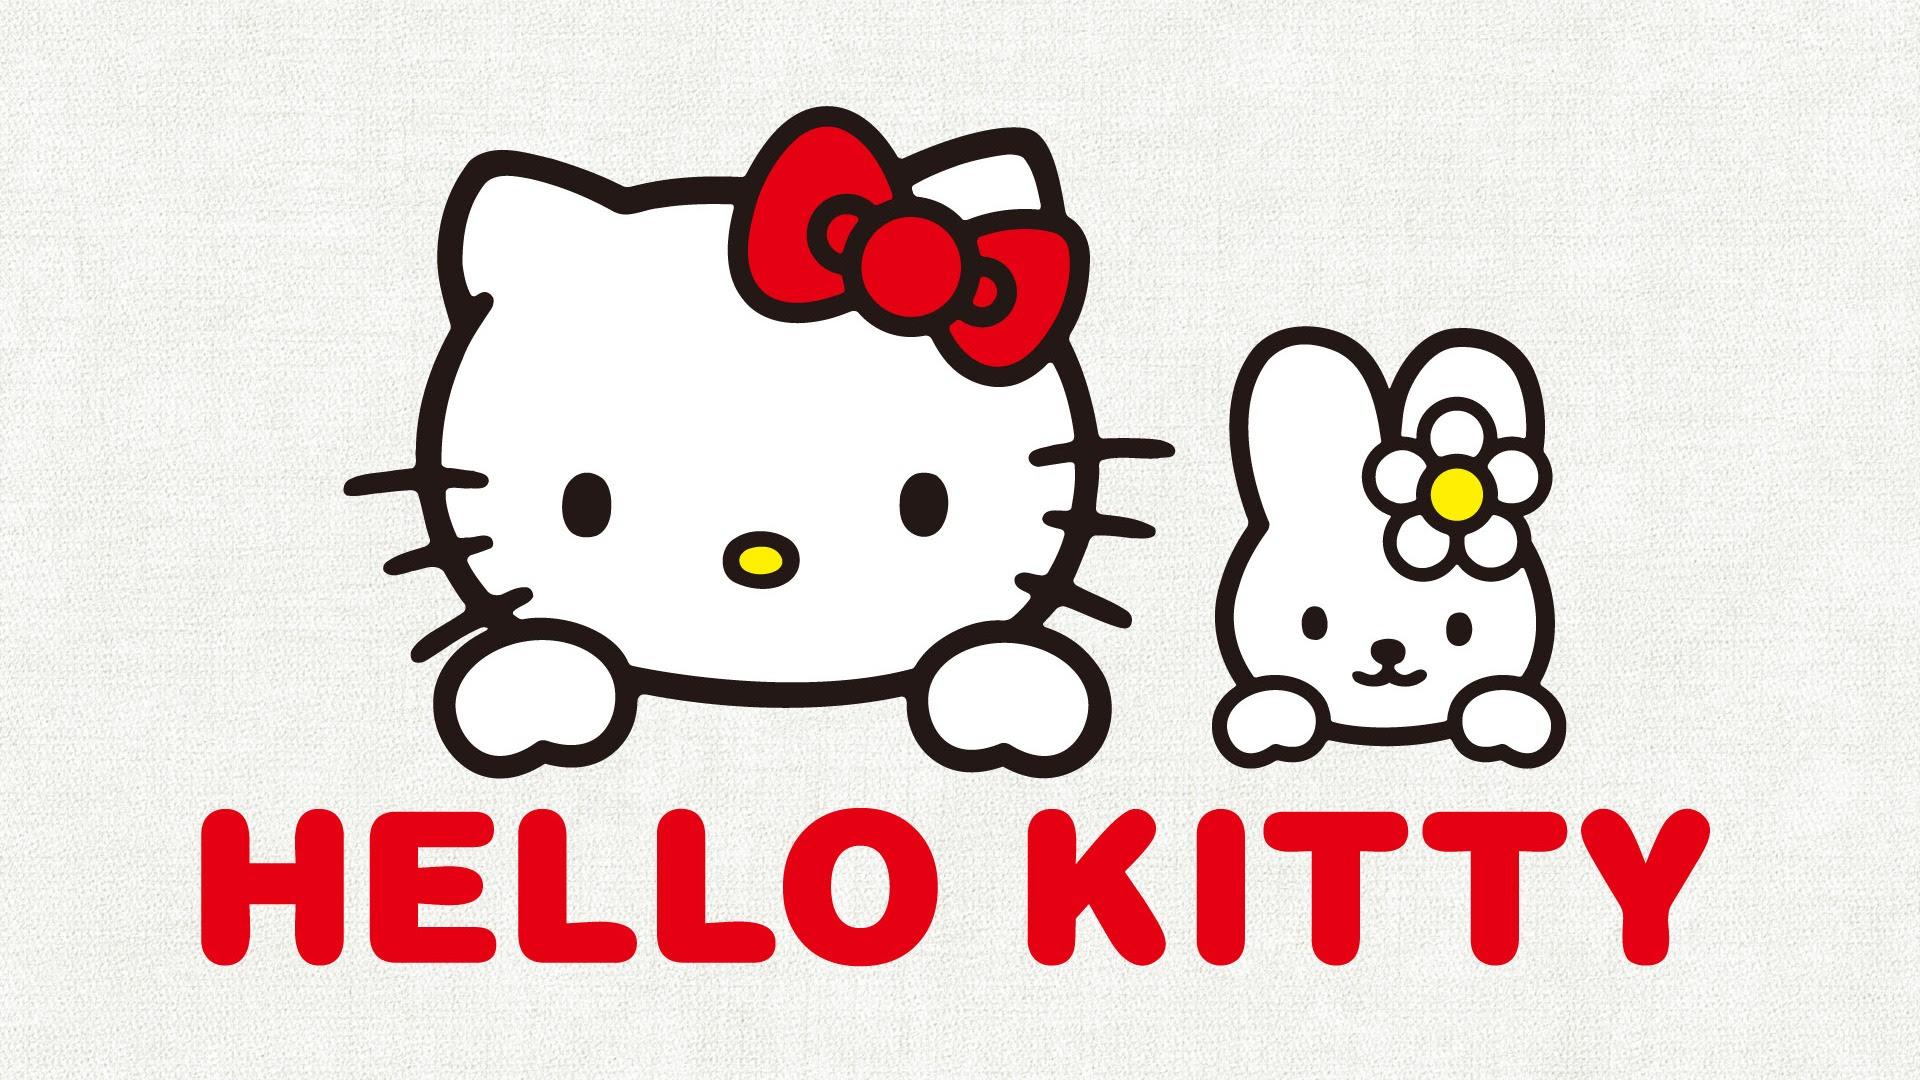 1920x1080 ハローキティが可愛い壁紙 フルhd Hello Kitty